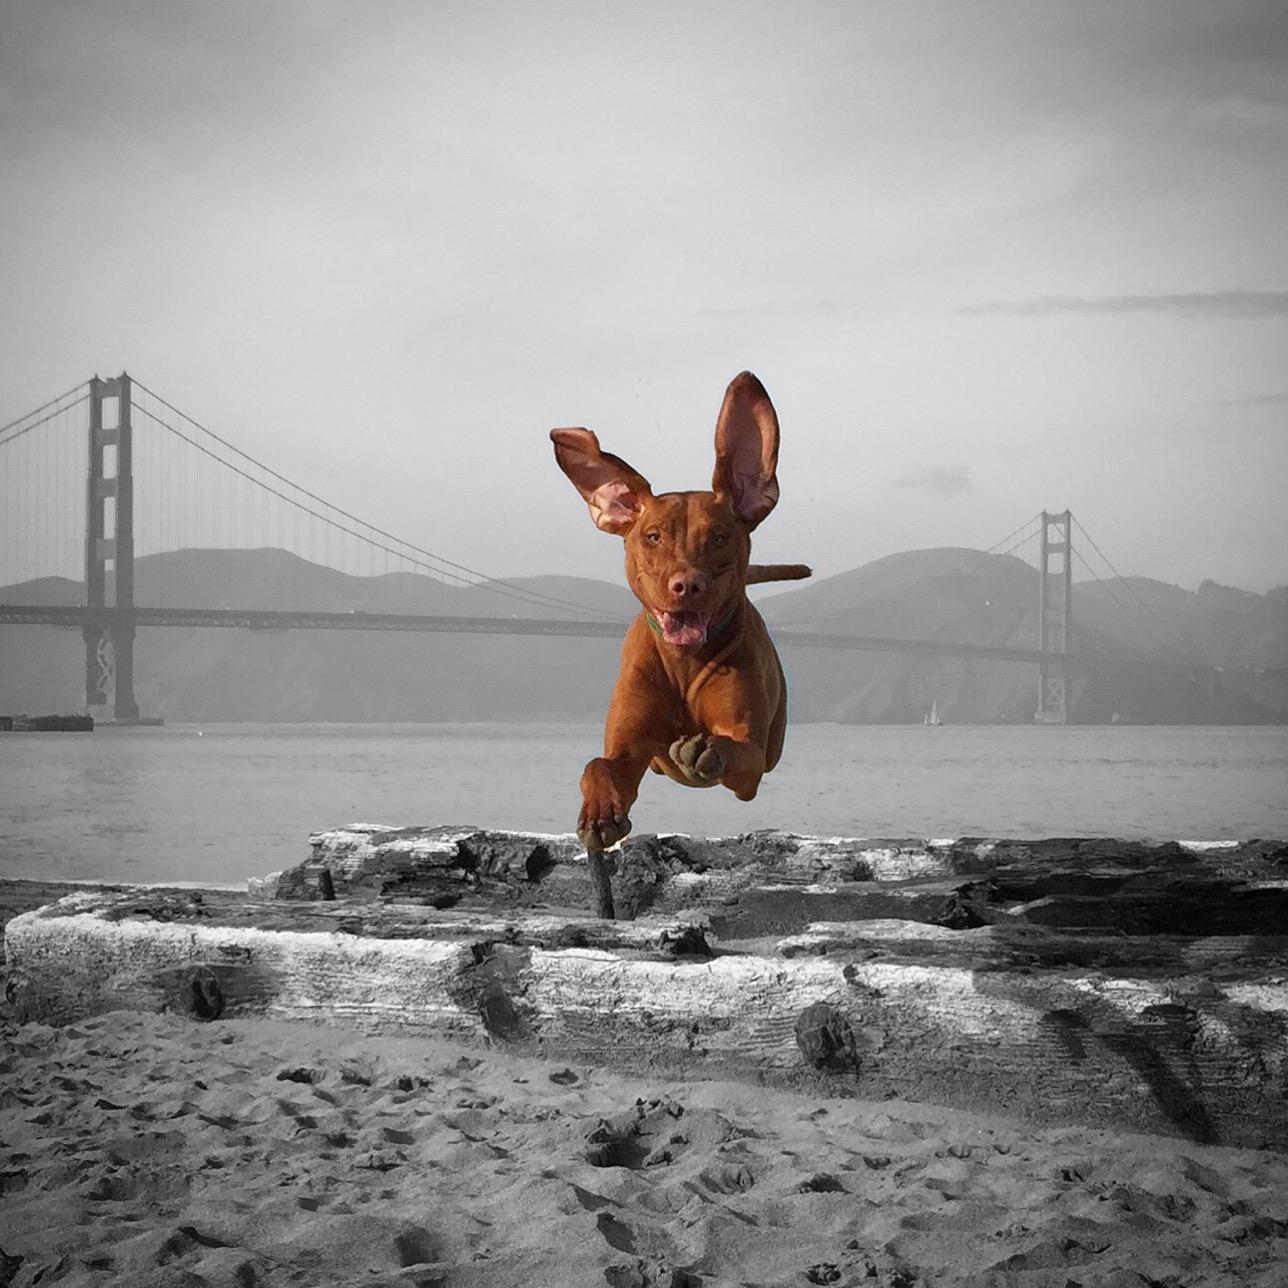 San Francisco dog walking profession